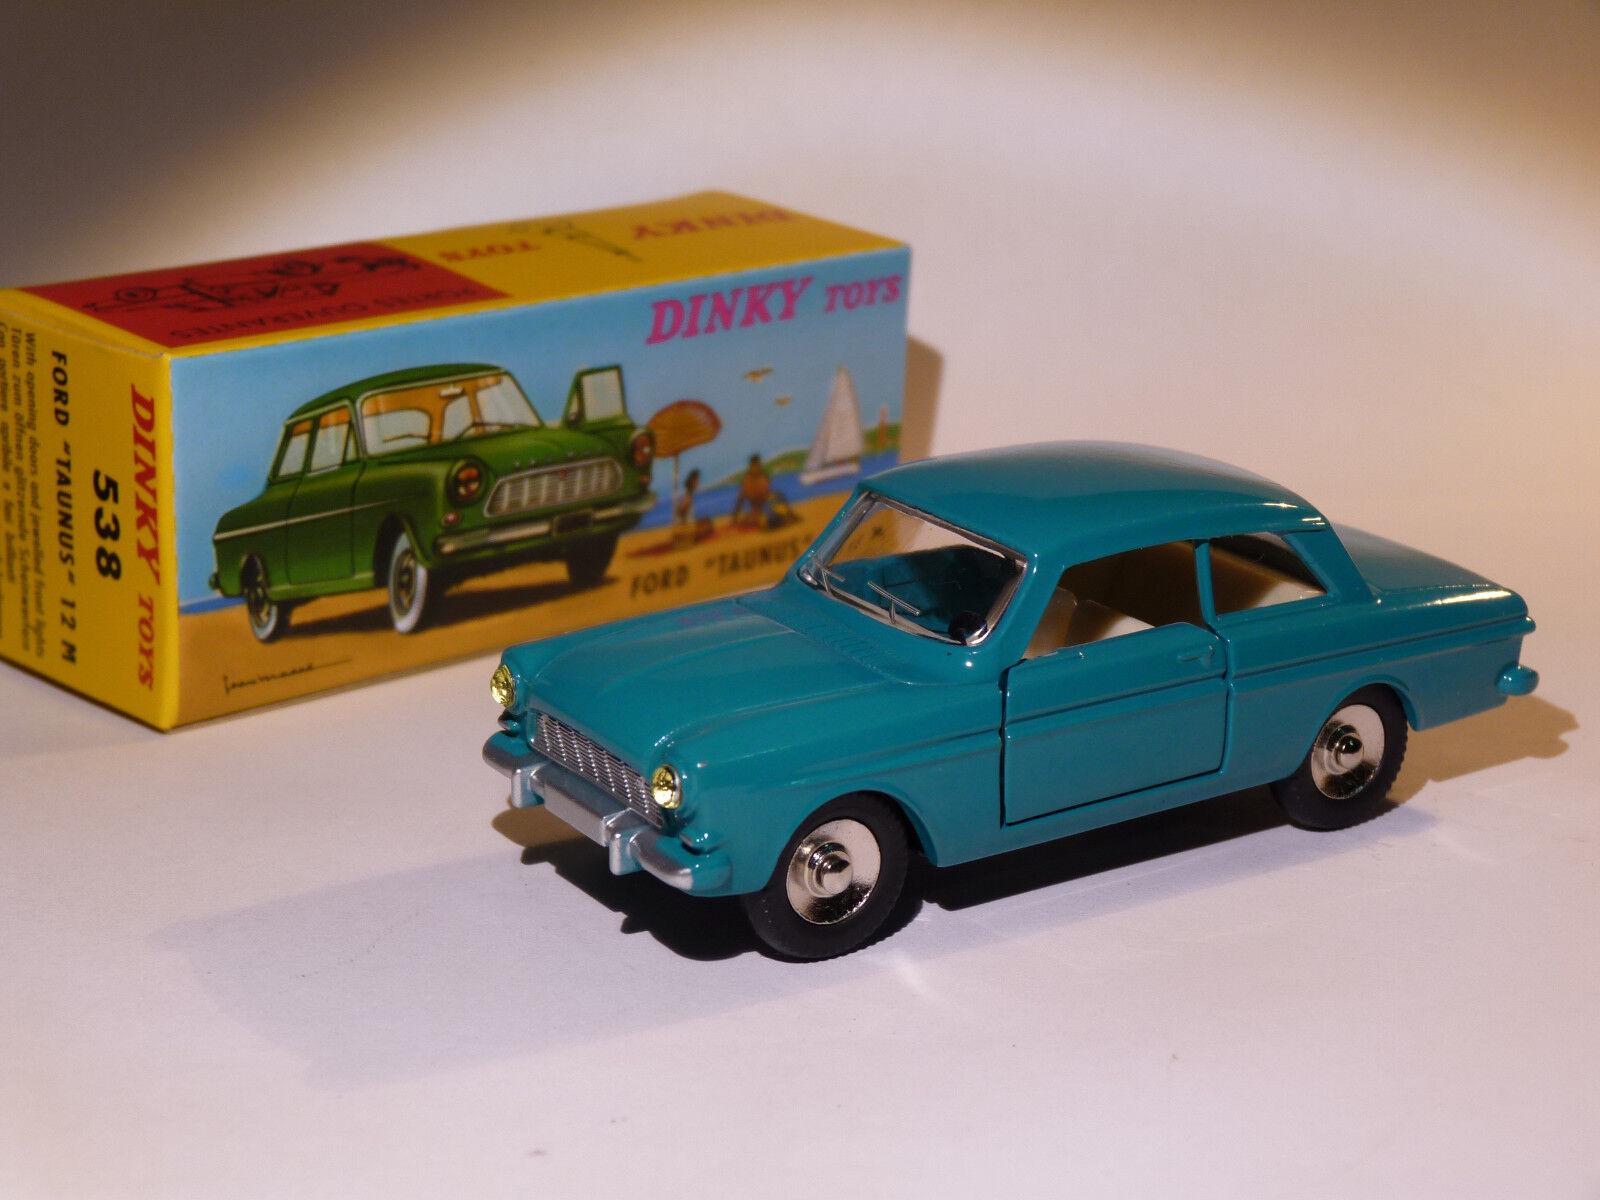 Ford TAUNUS 12M - ref 538 au au au 1 43 de dinky toys atlas da1341